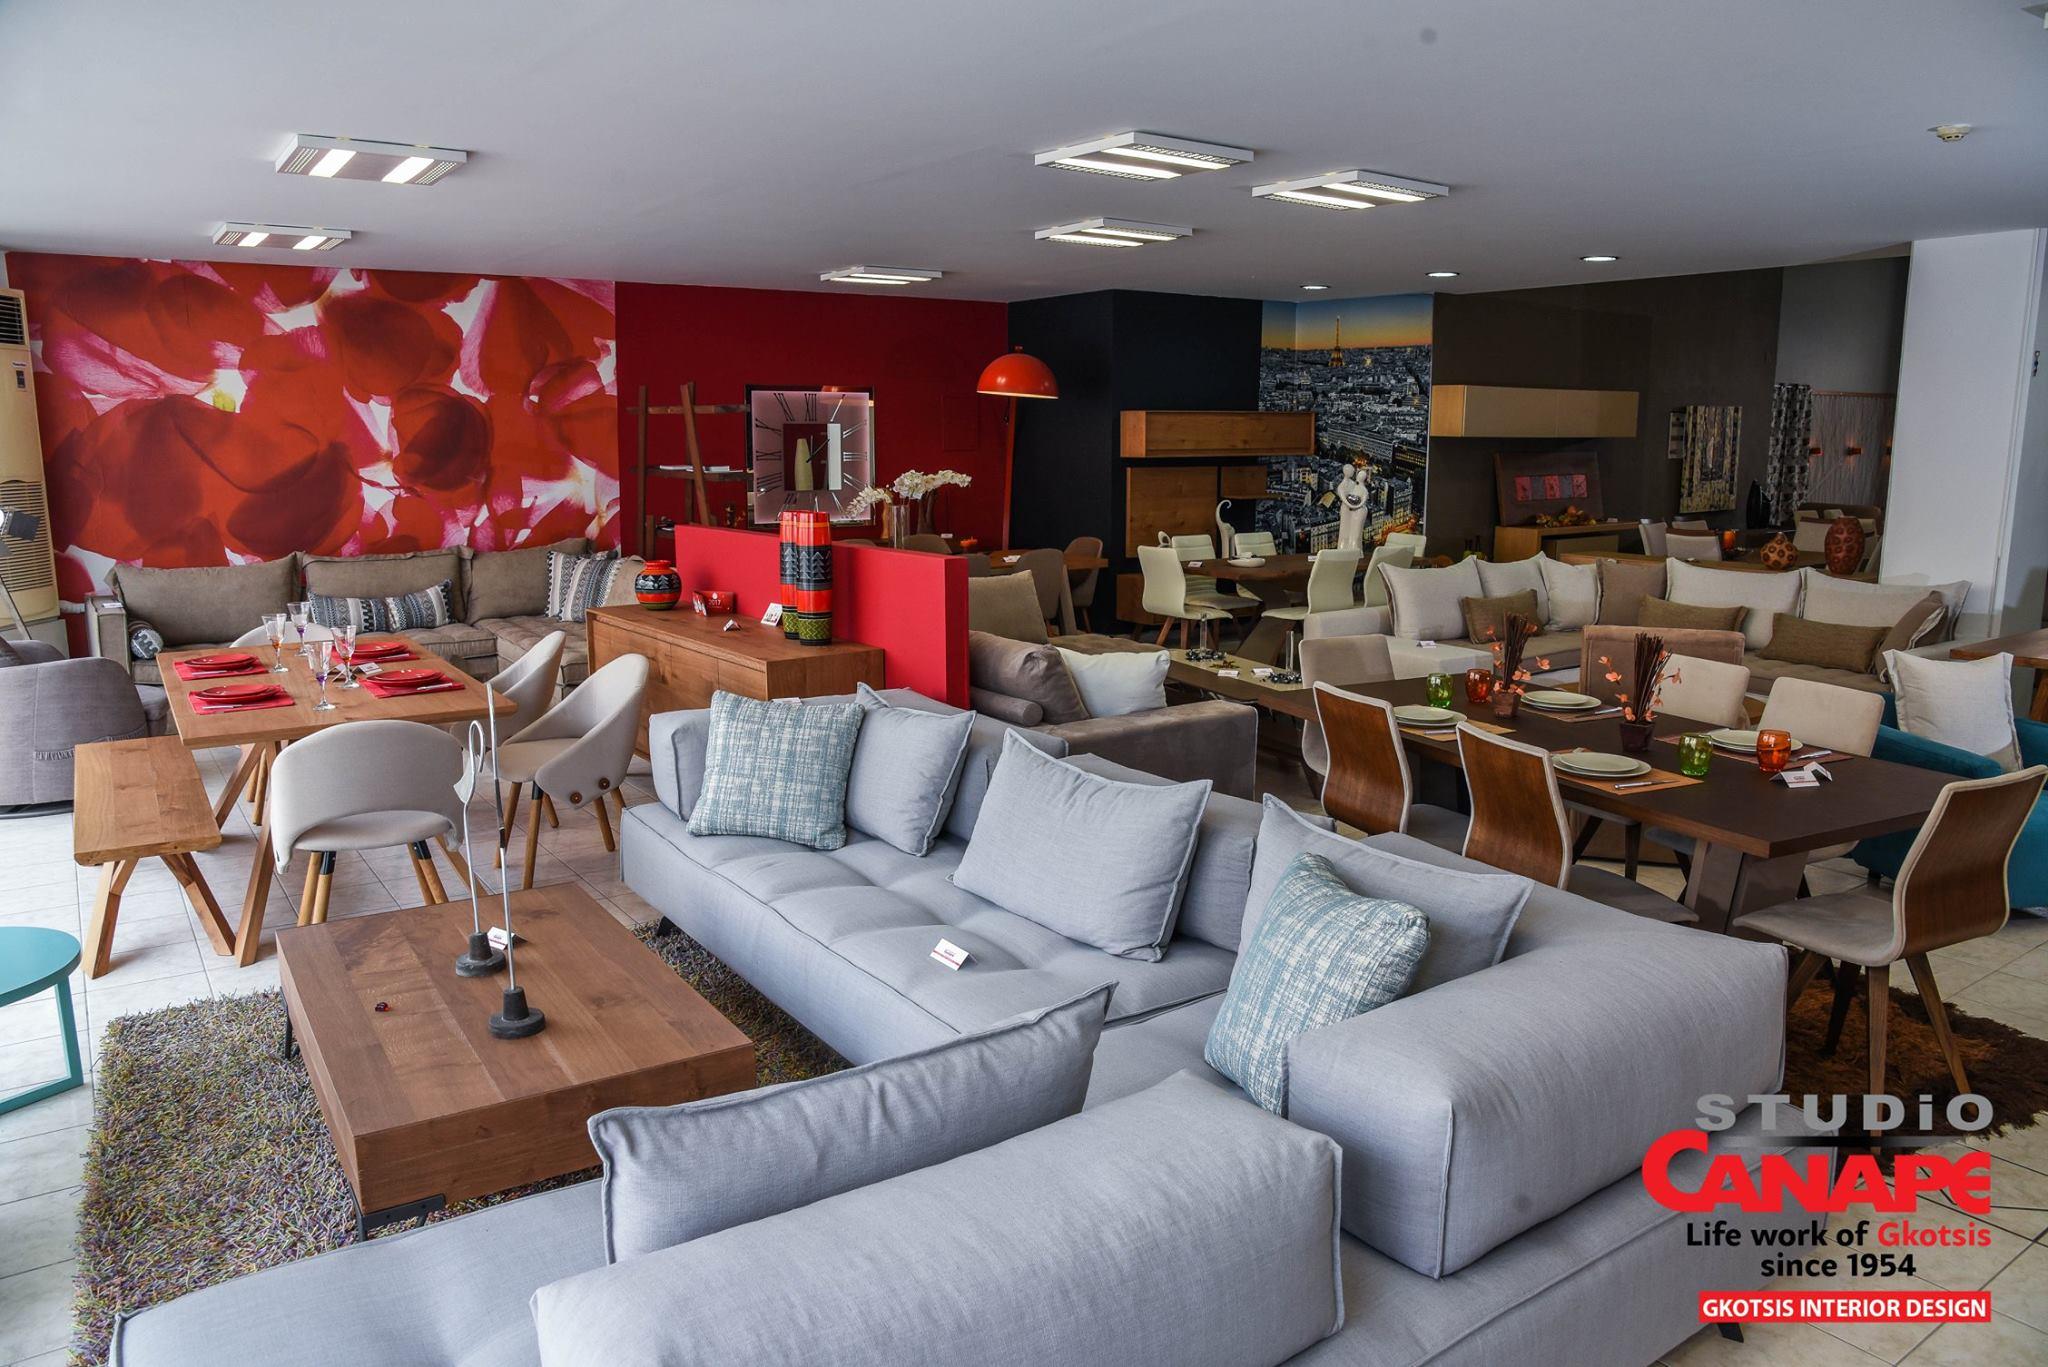 studio canape x. Black Bedroom Furniture Sets. Home Design Ideas